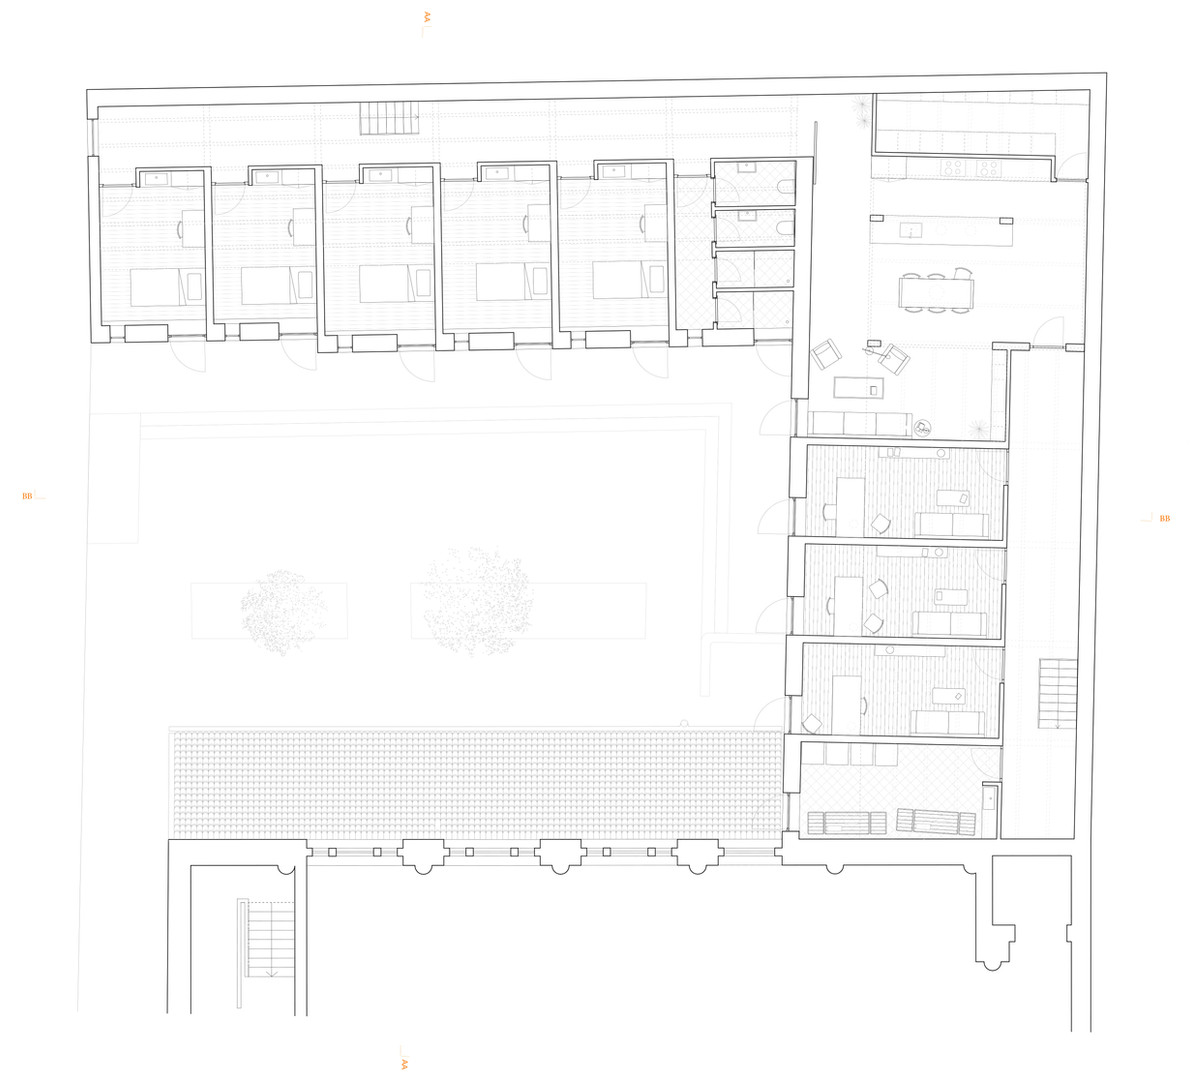 AK_proposedsplan+1_01.jpg